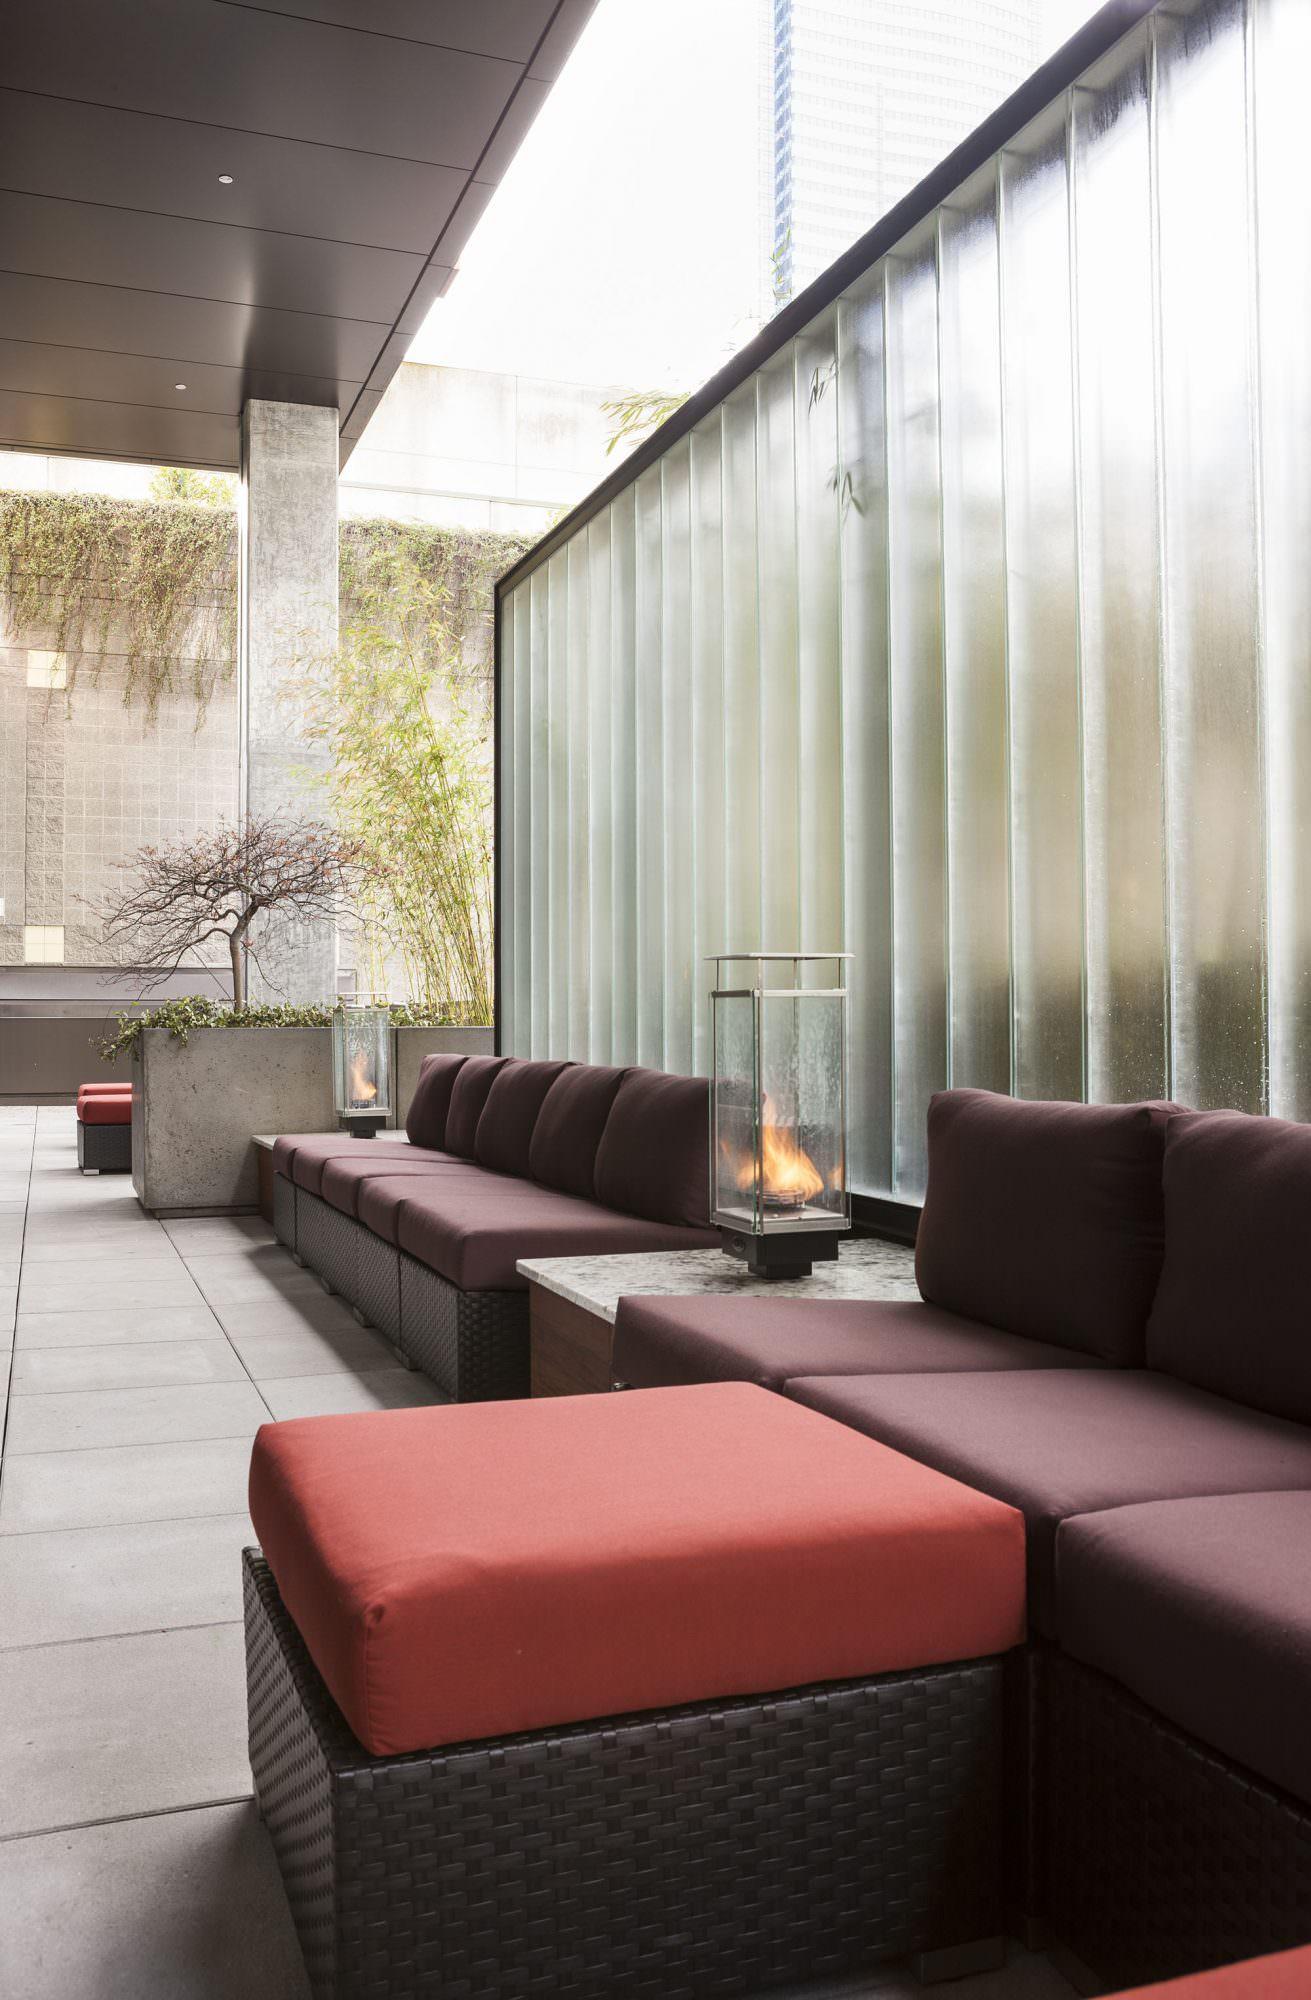 Premiere on Pine landscape architecture